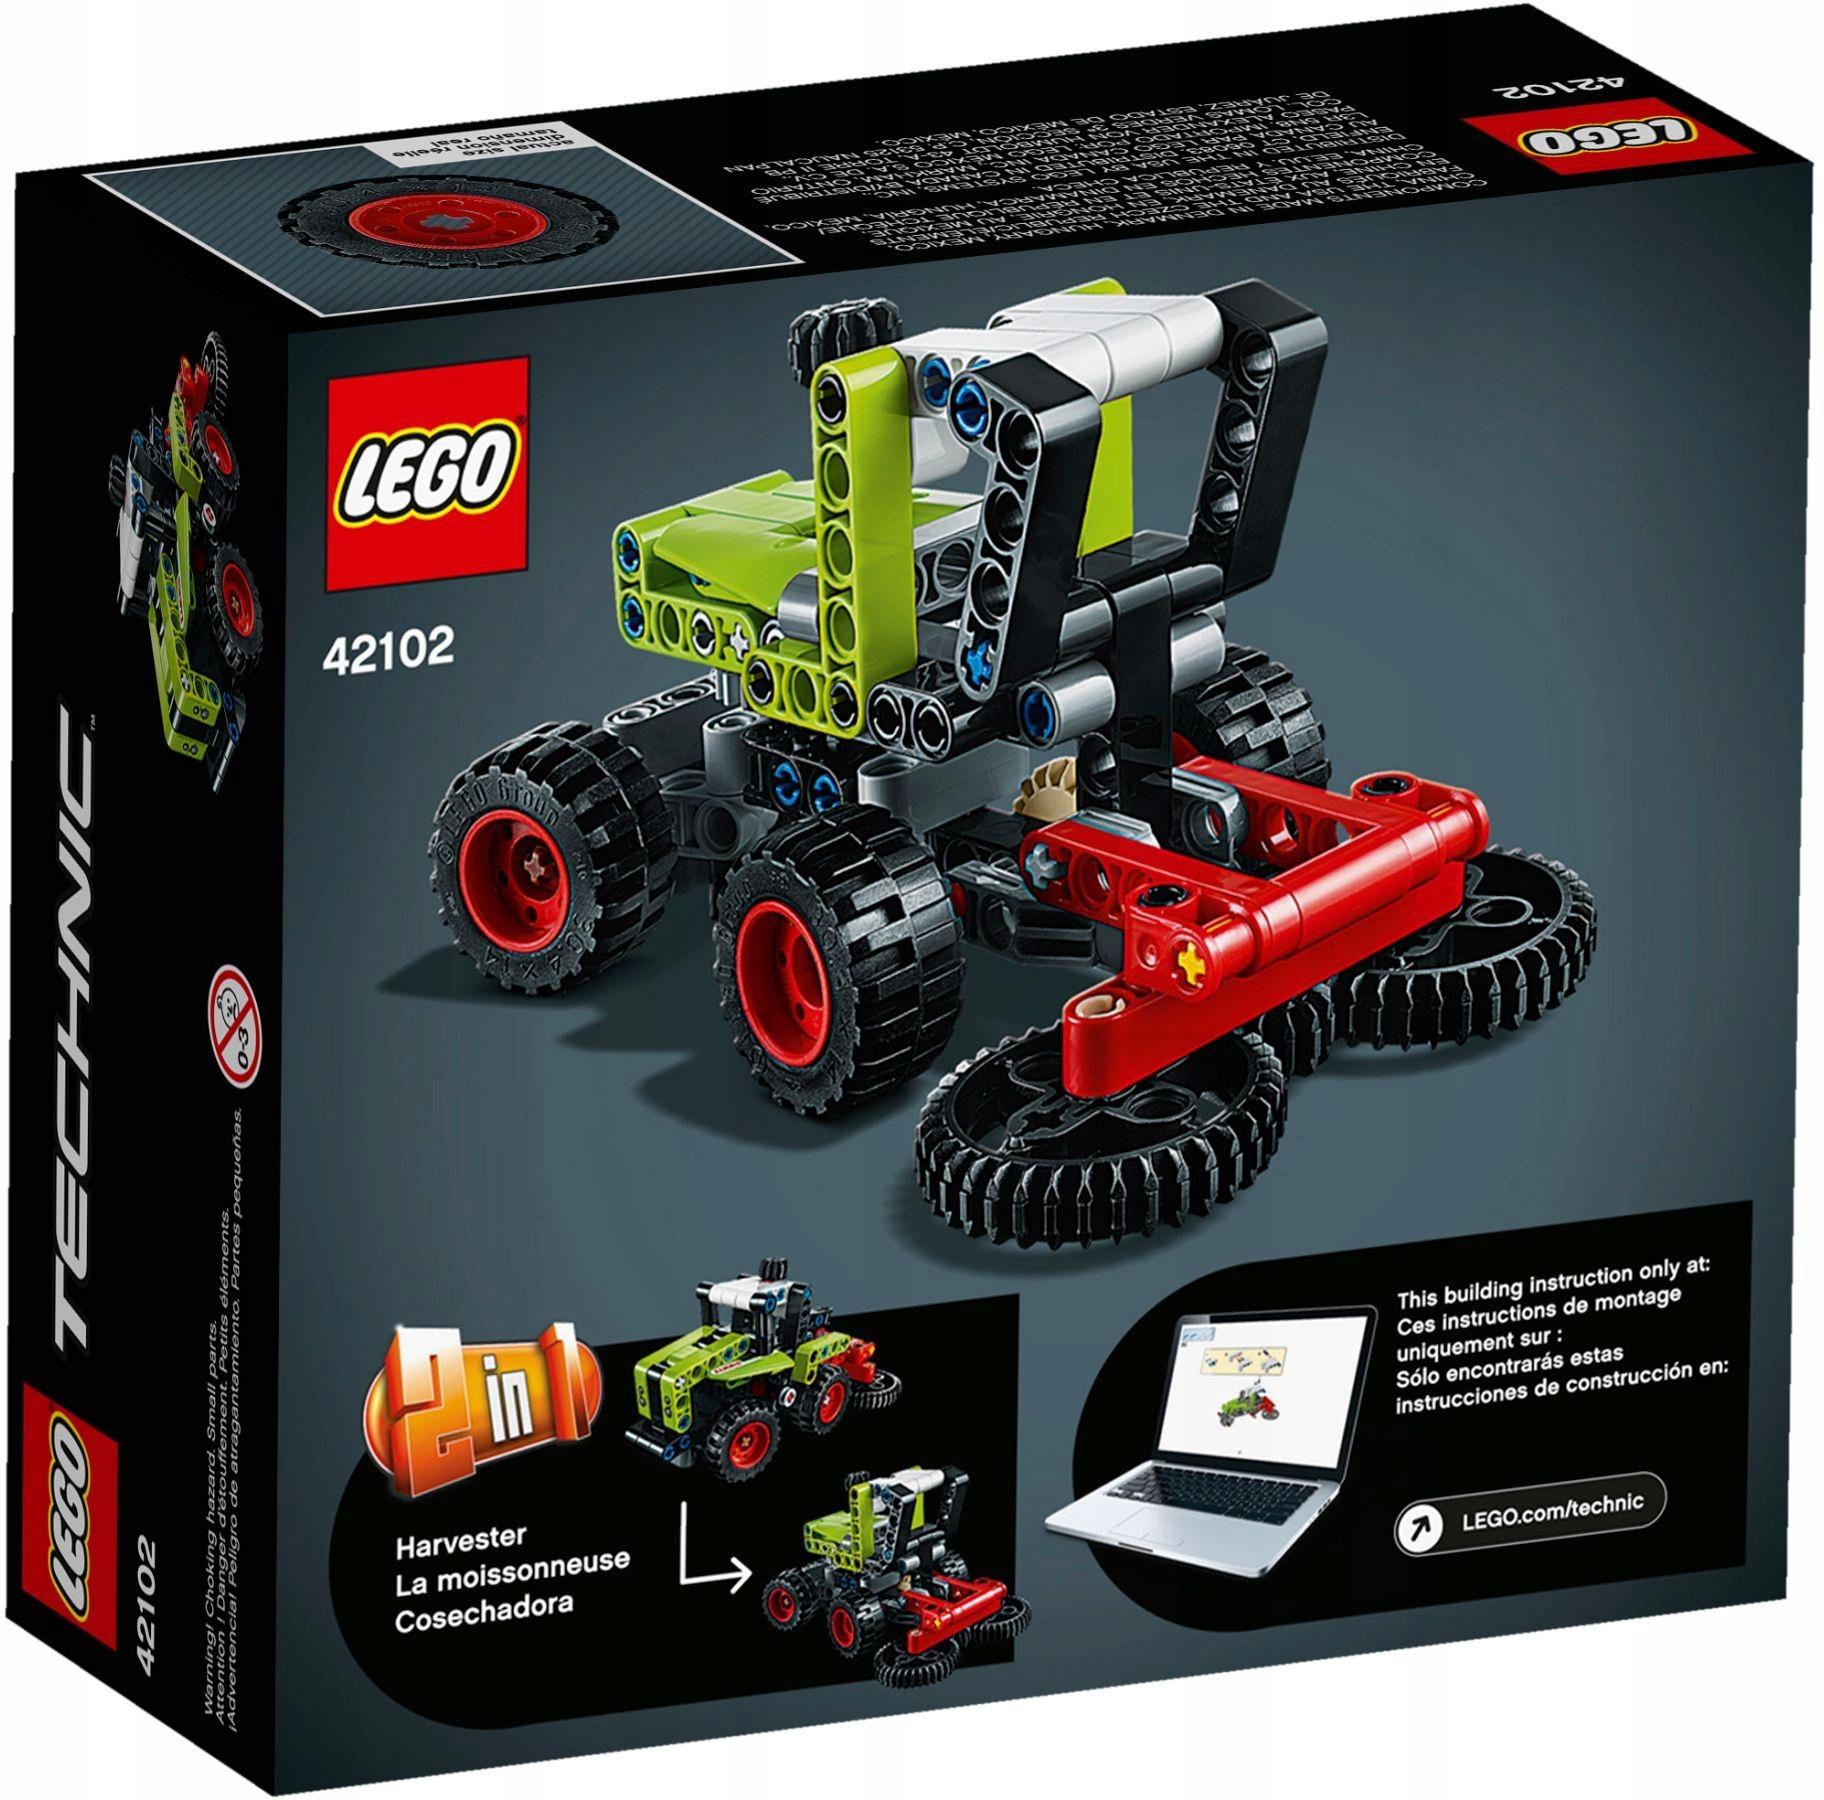 LEGO 42102 Technic Traktor Kombajn PEWNI SZYBKO Bohater brak